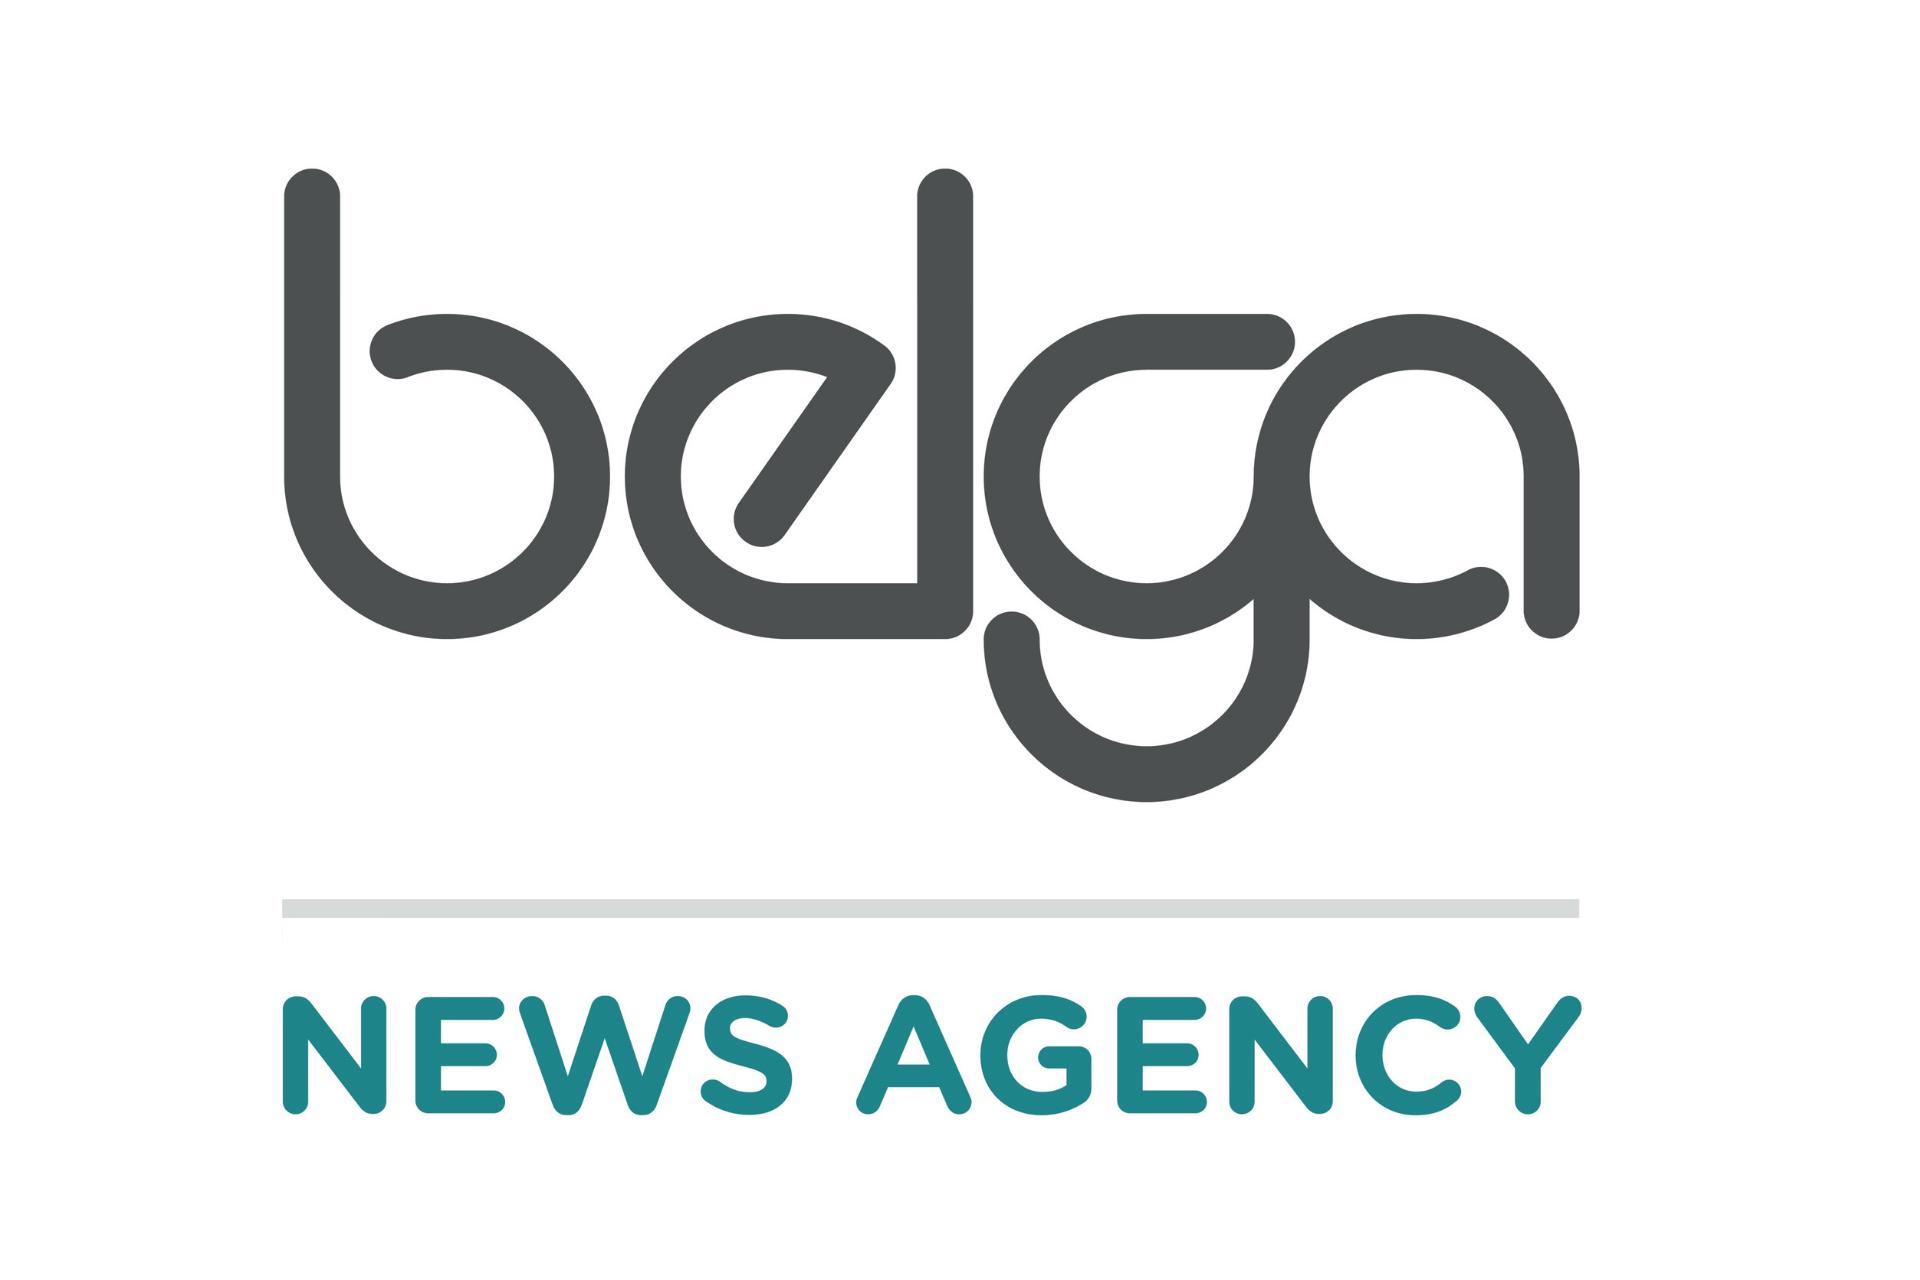 Belga News Agency